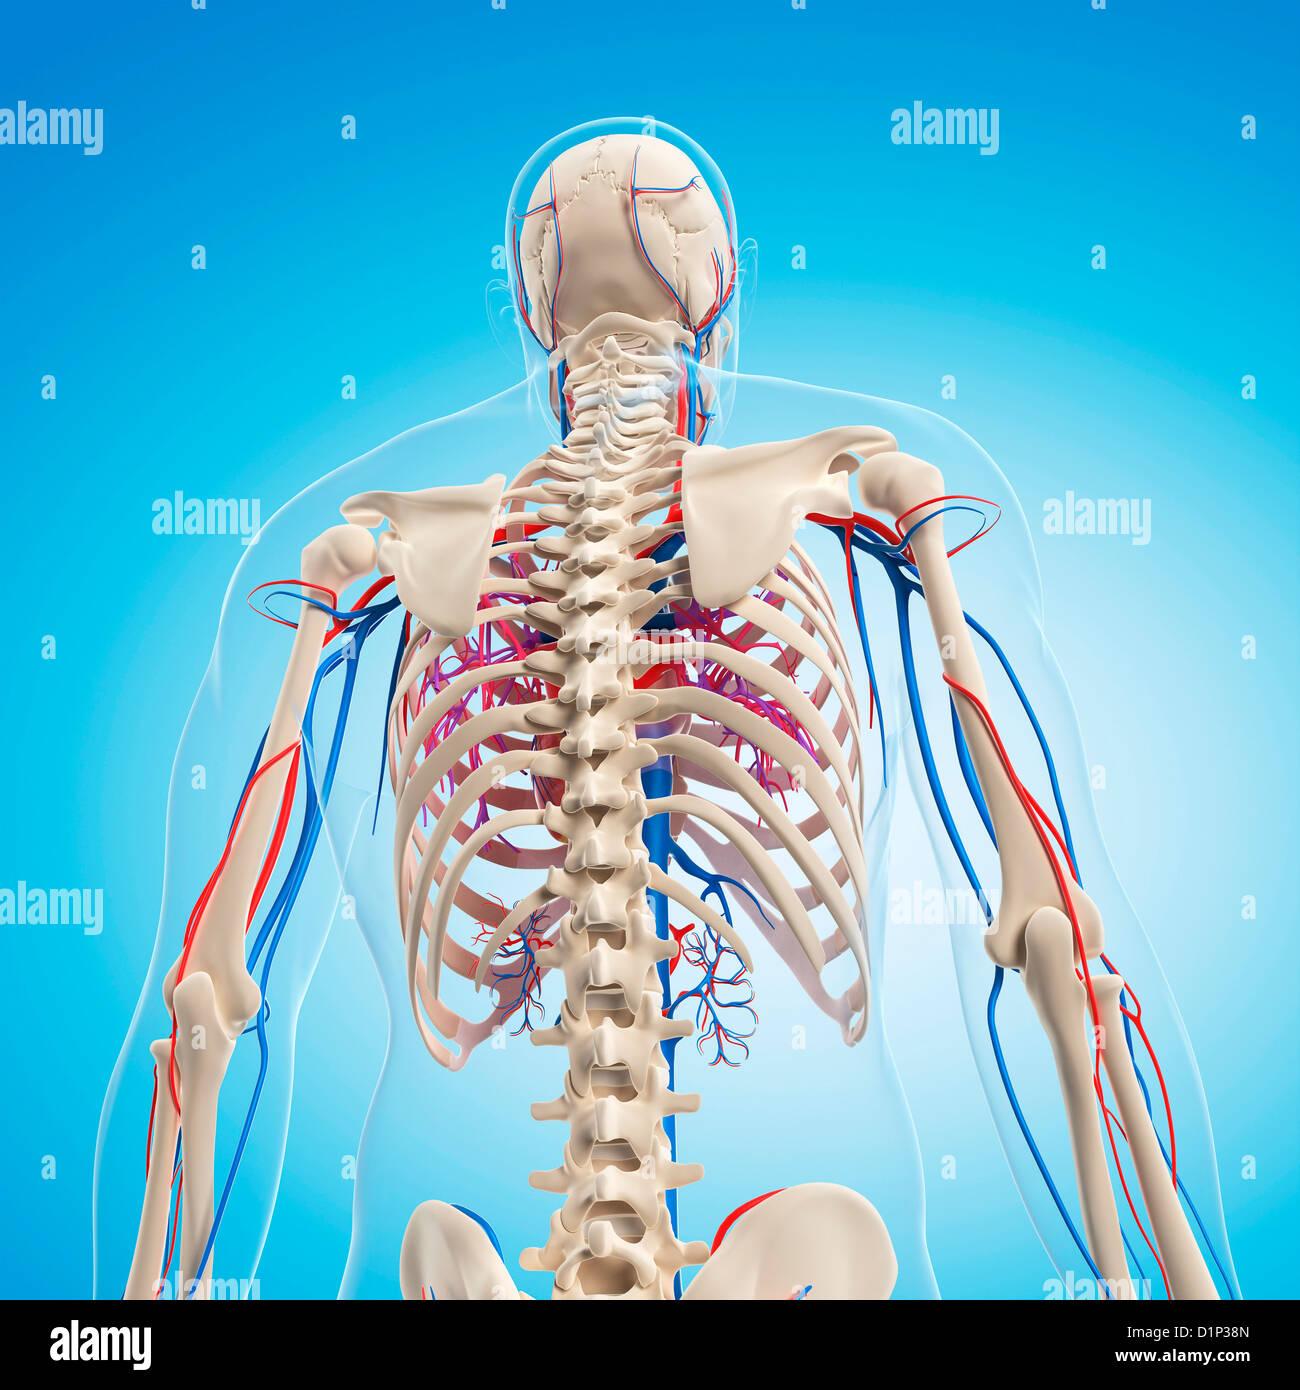 Human Skeletal Anatomy Stock Photos Human Skeletal Anatomy Stock